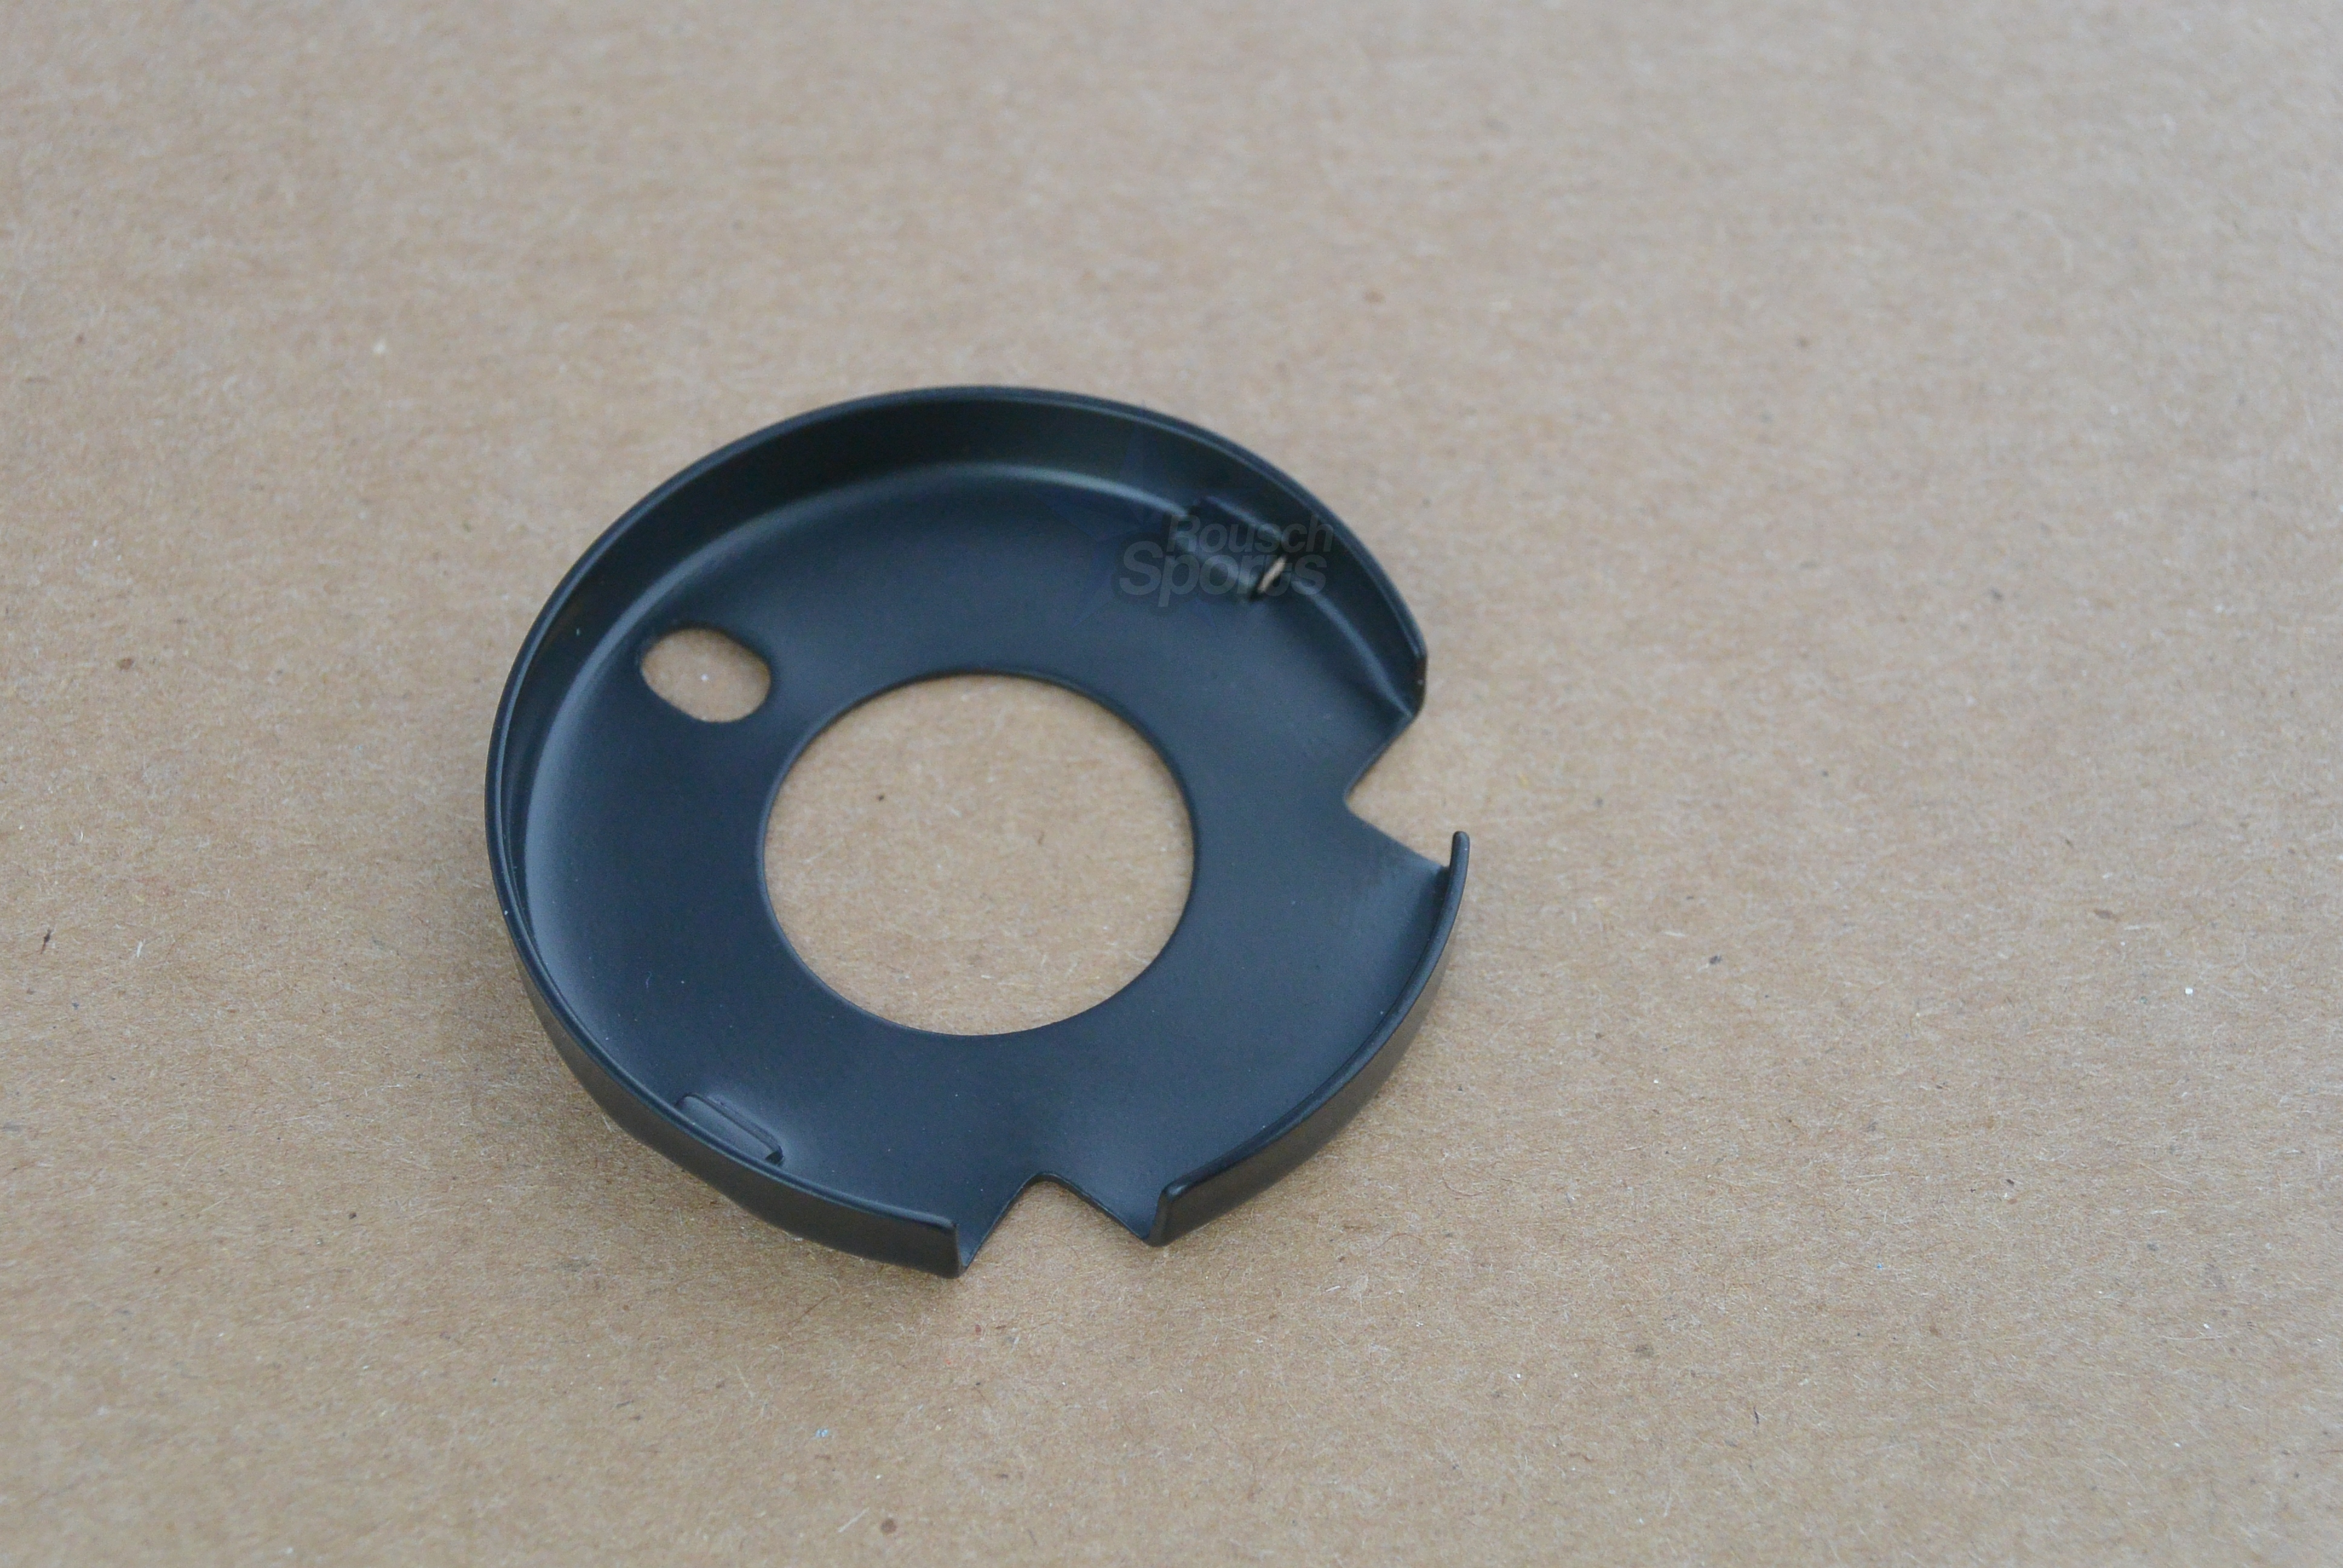 how to cut quarter round end cap